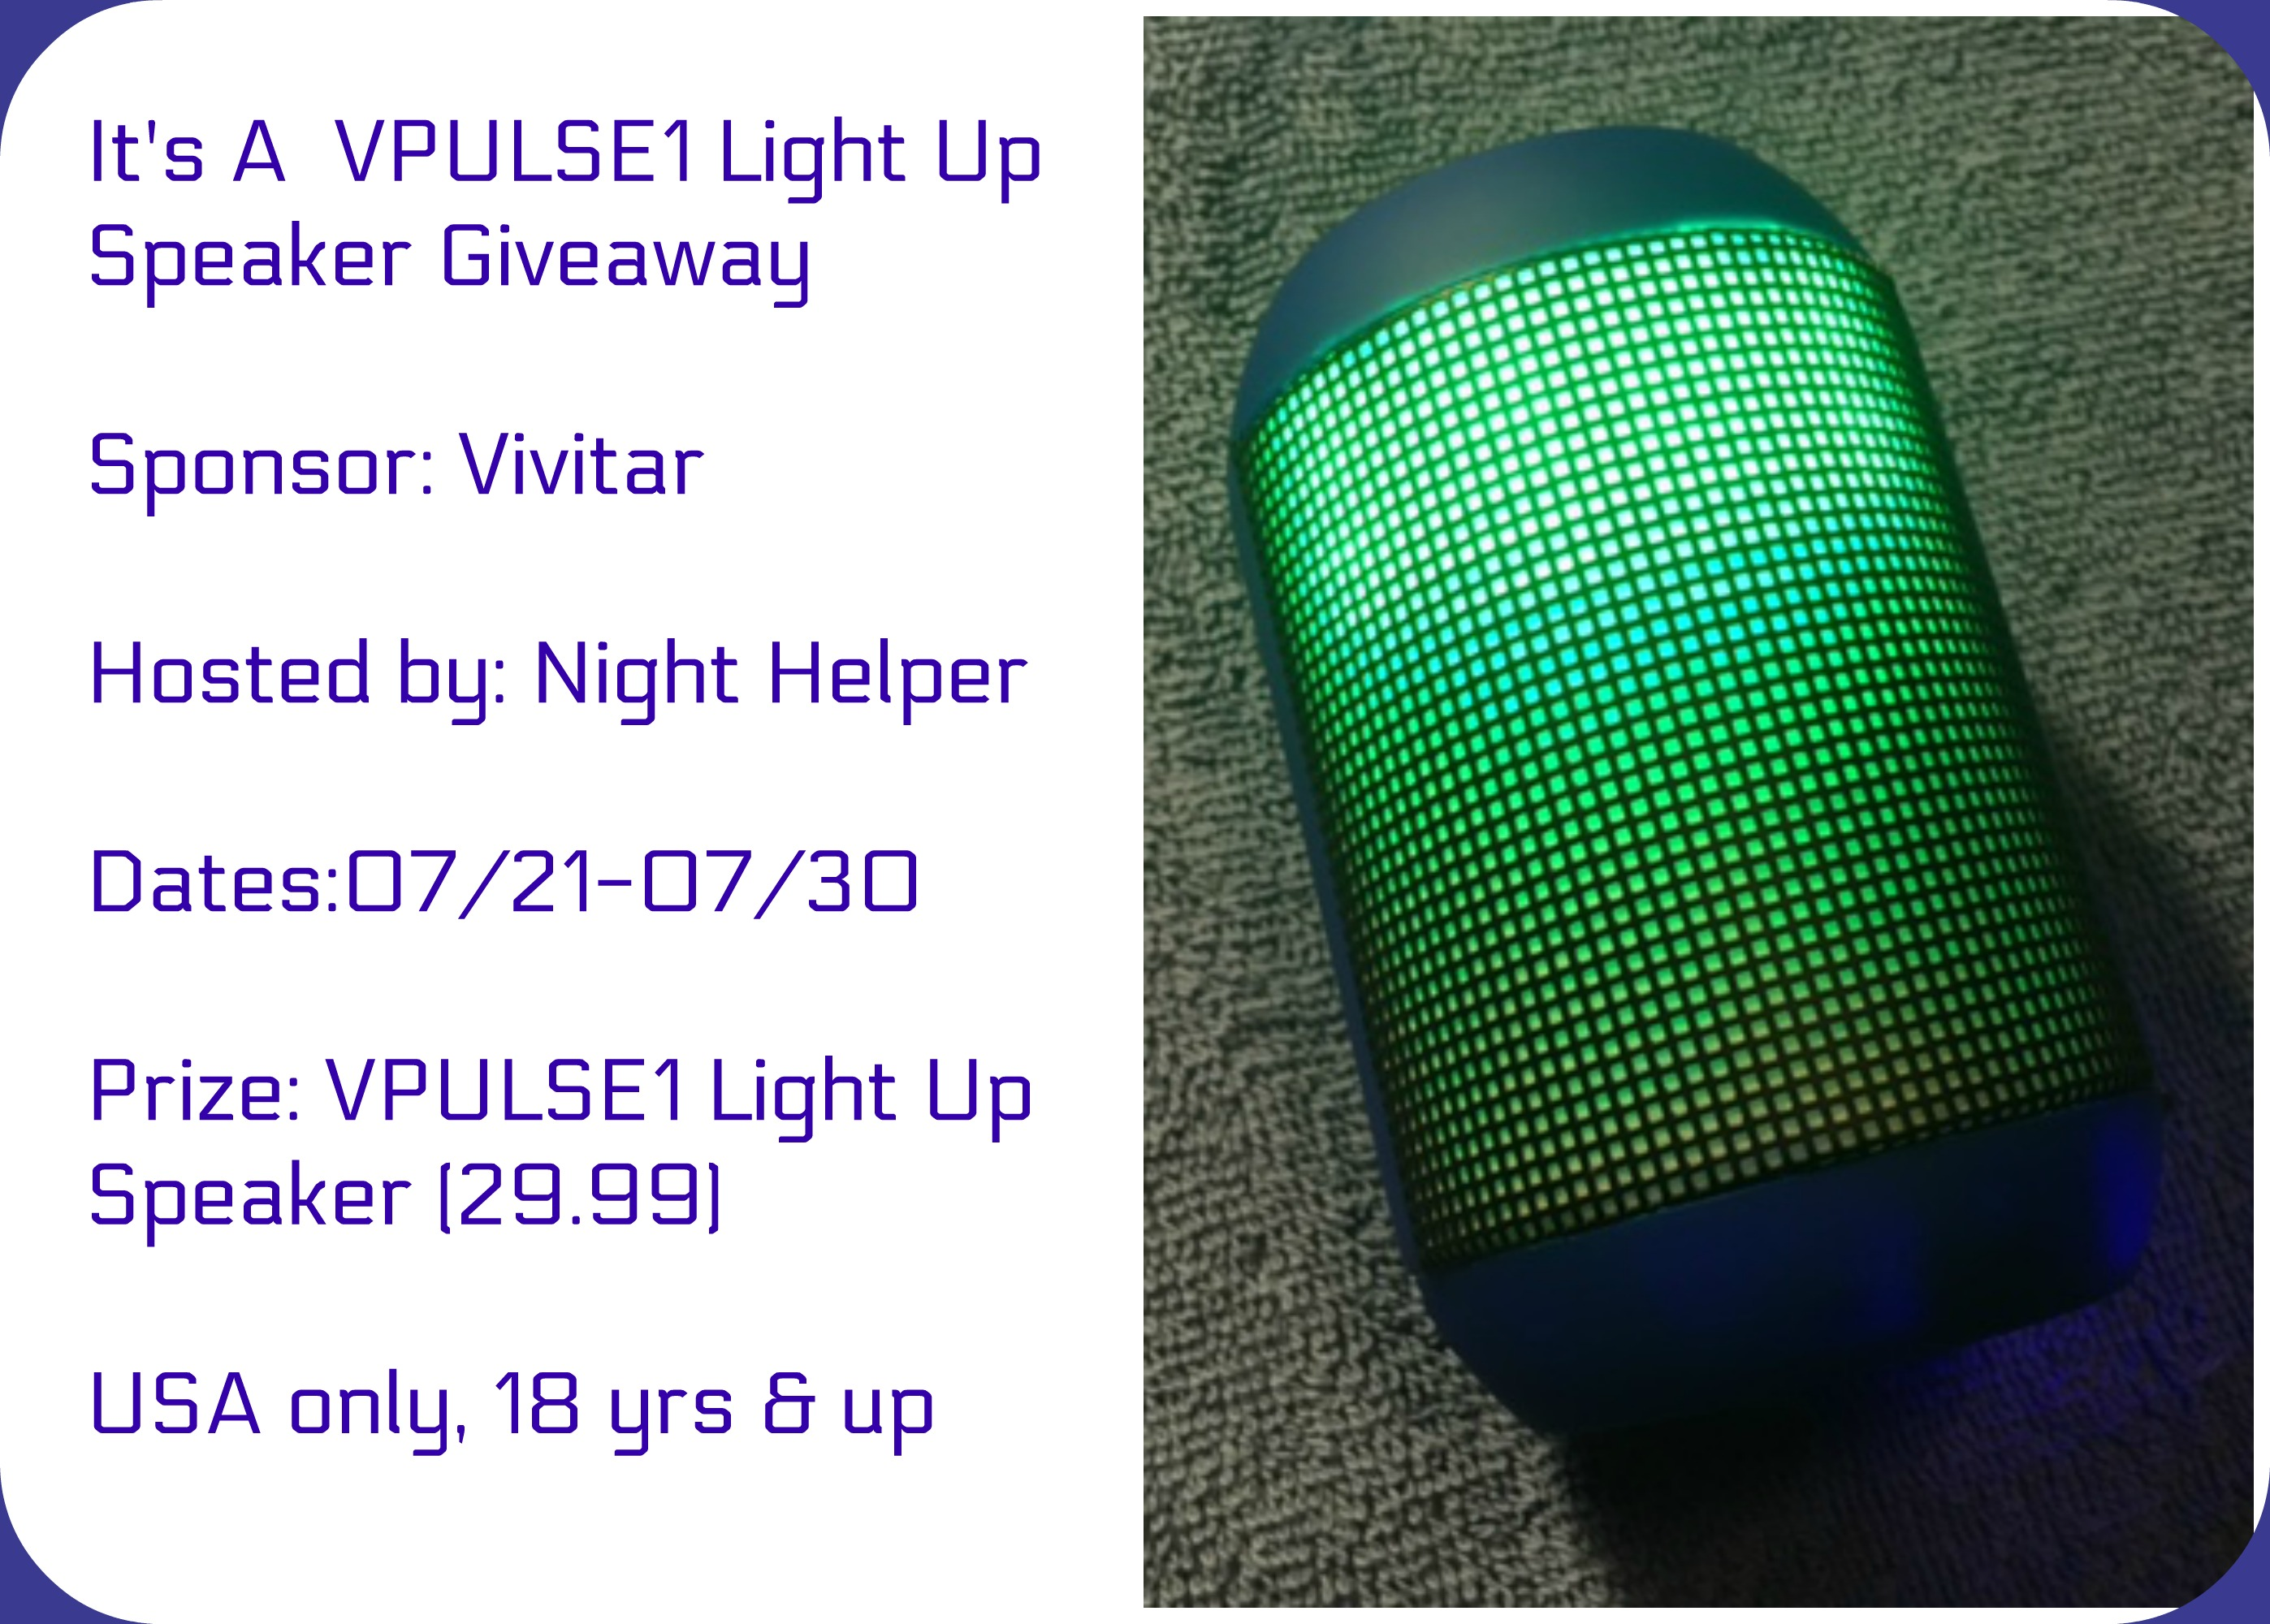 It's A VPULSE1 Light Up Speaker Giveaway